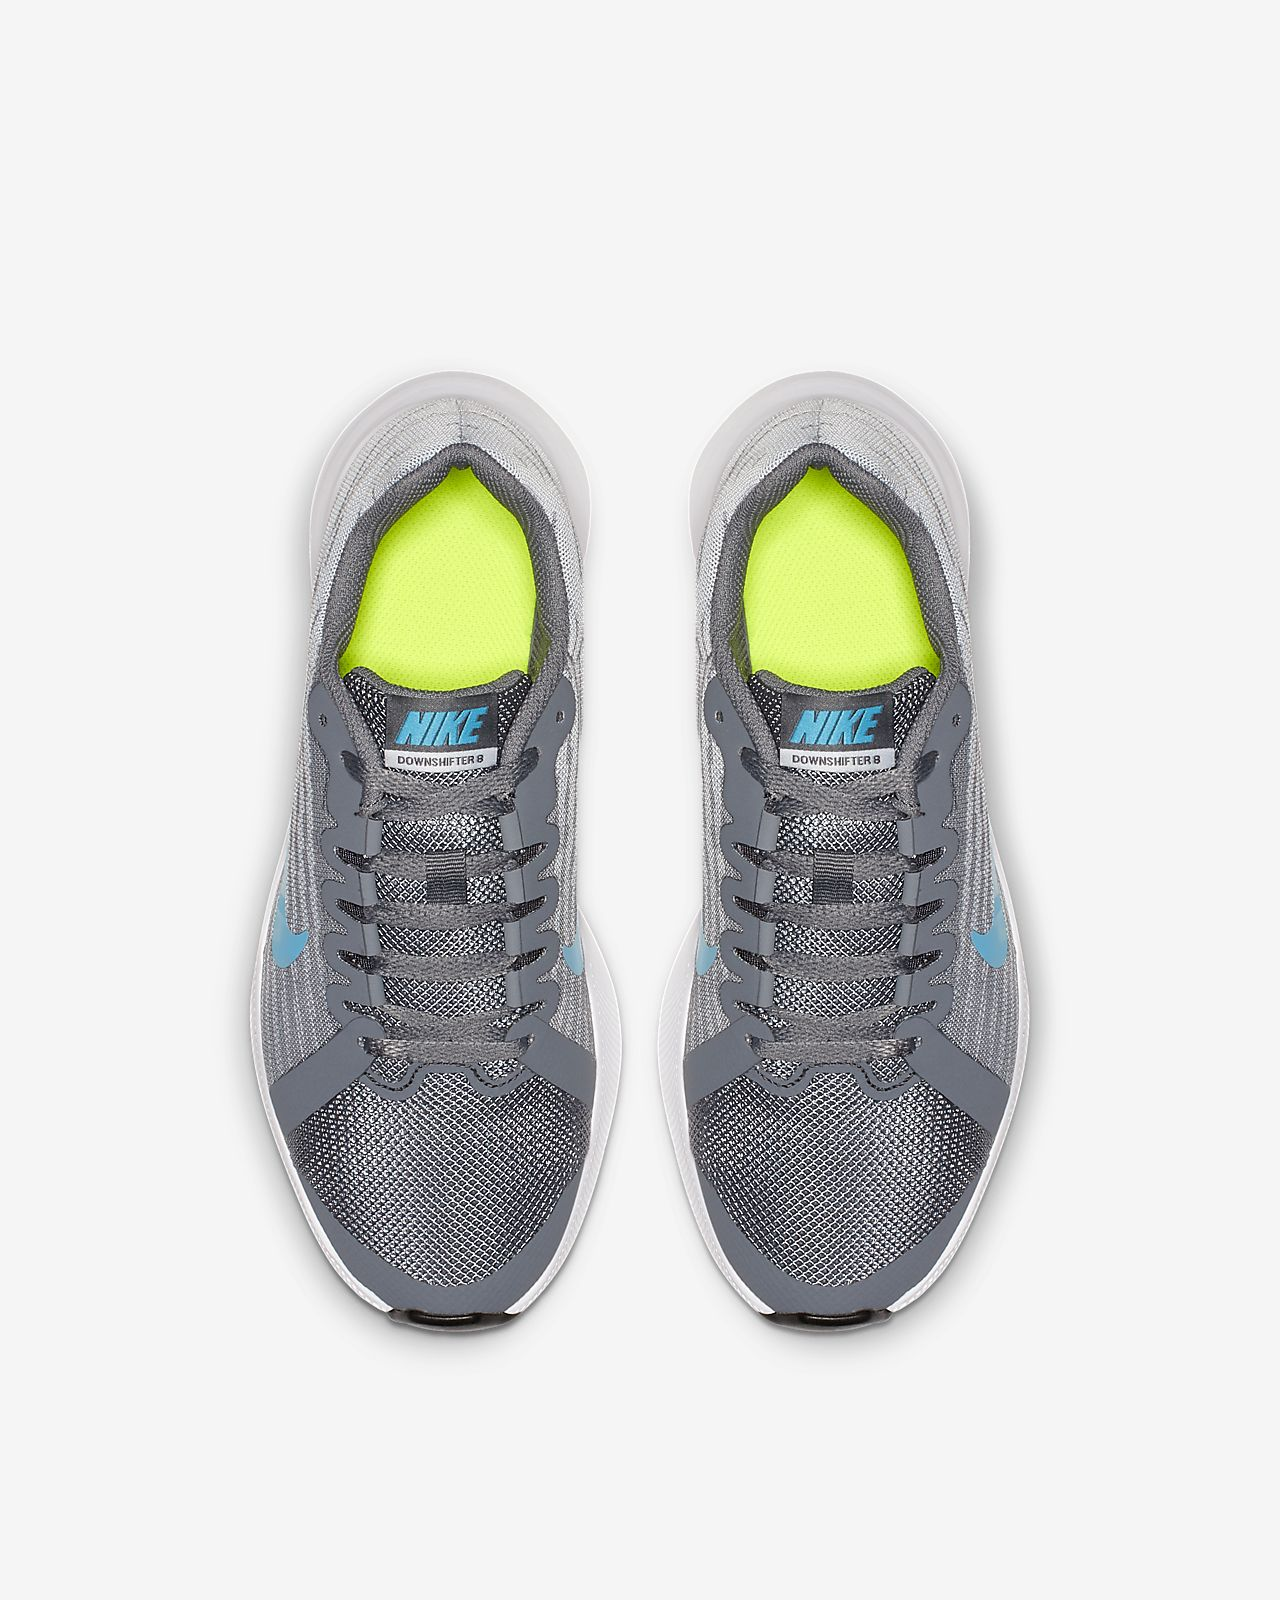 Calzado de running para niños talla grande Nike Downshifter 8